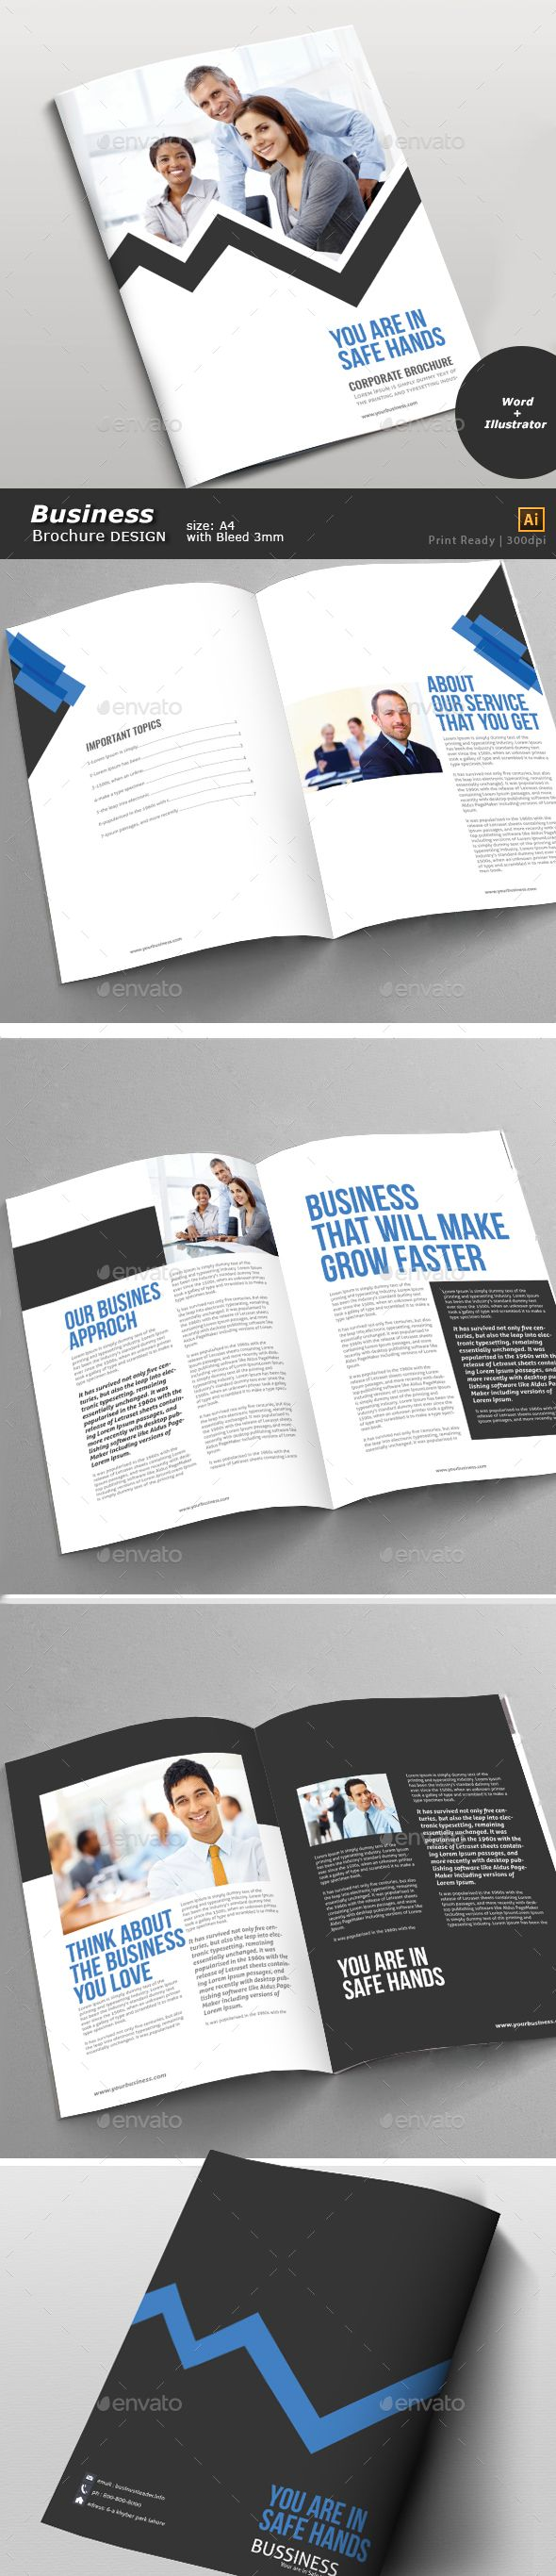 Business Brochure  Business Brochure Brochures And Template